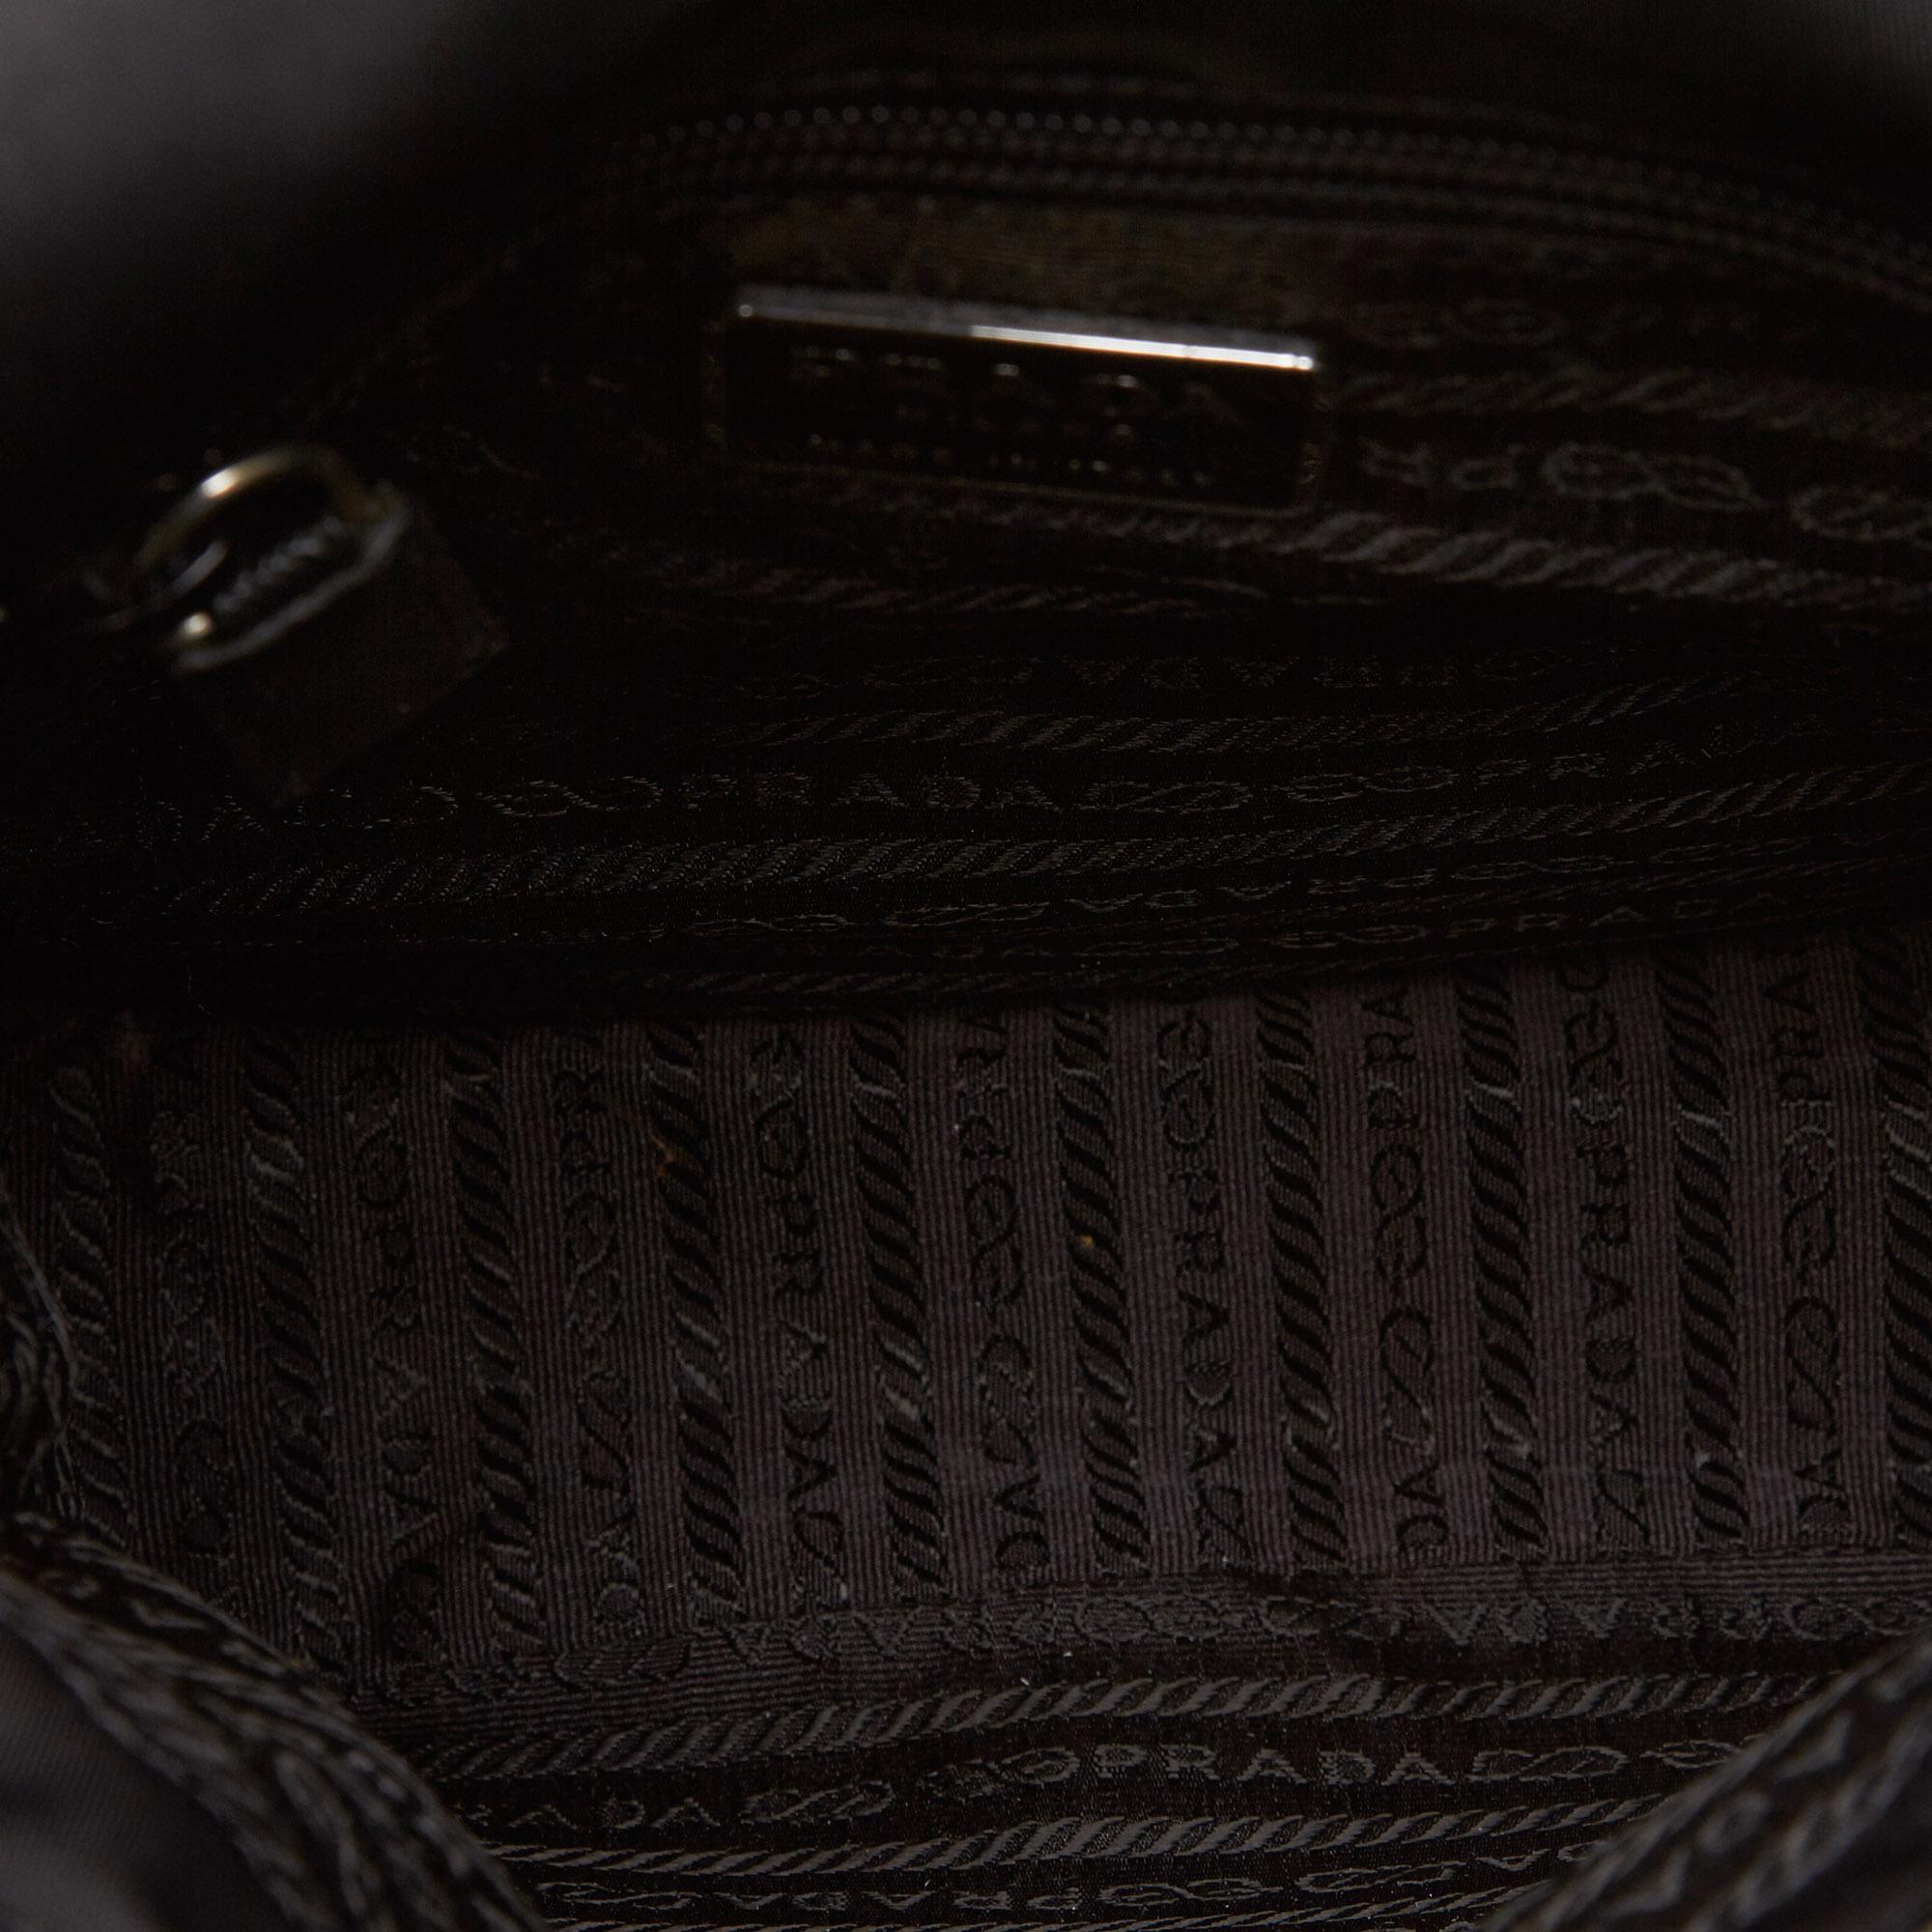 13d01899fe Vintage Prada Black Nylon Fabric Crossbody Bag Italy 5 5 of 12 ...